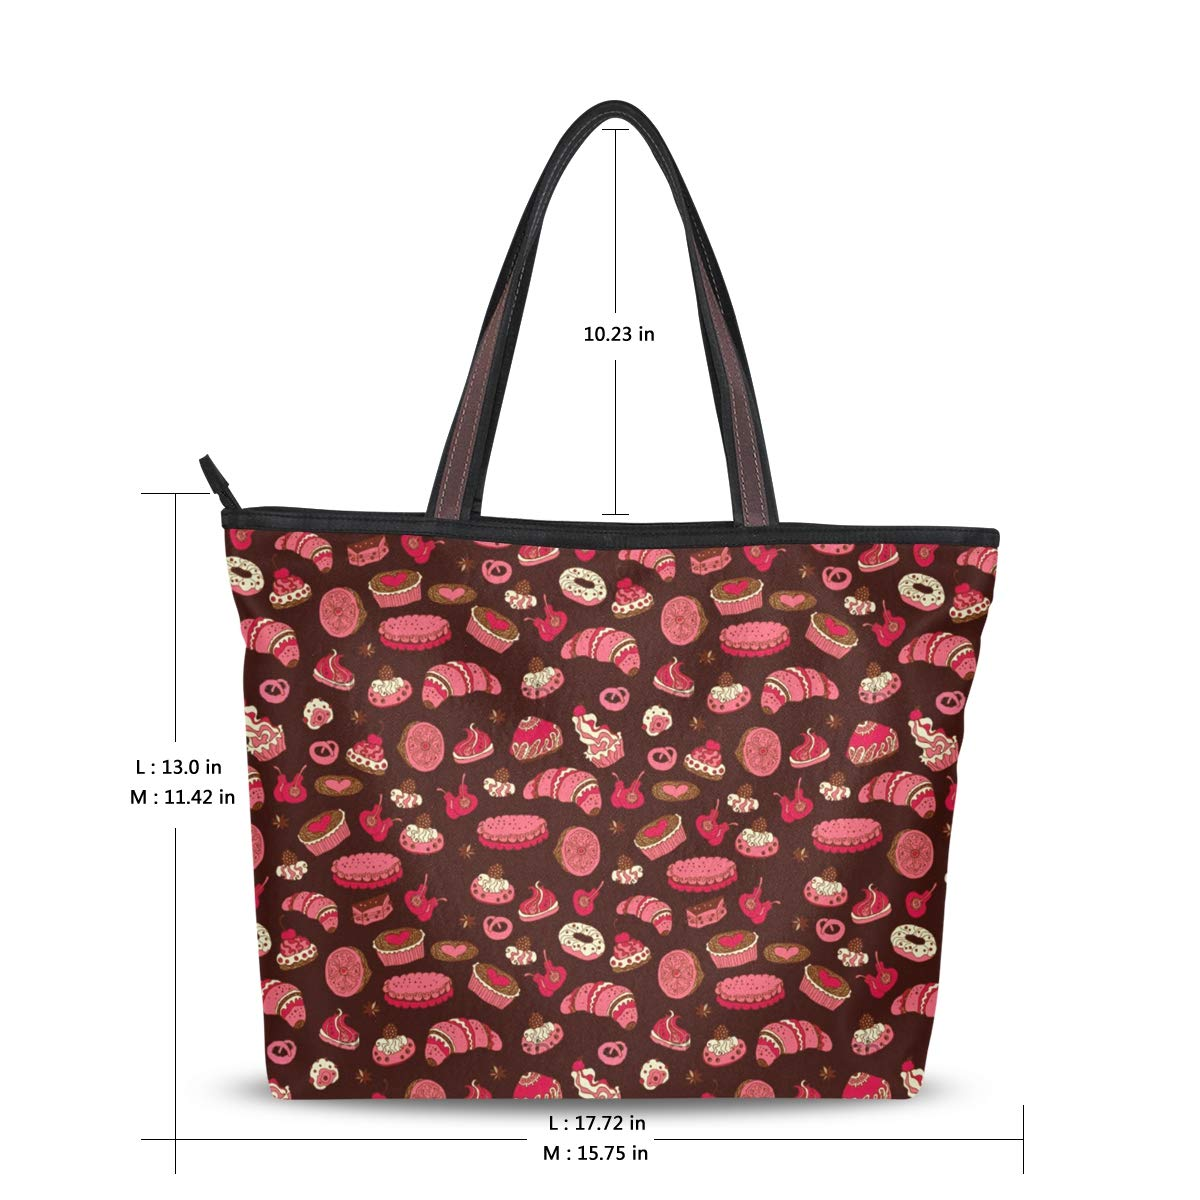 Women Pastries Pattern Large Tote Bag Shoulder Bag Lightweight For Gym Hiking Picnic Travel Beach Waterproof Handbag